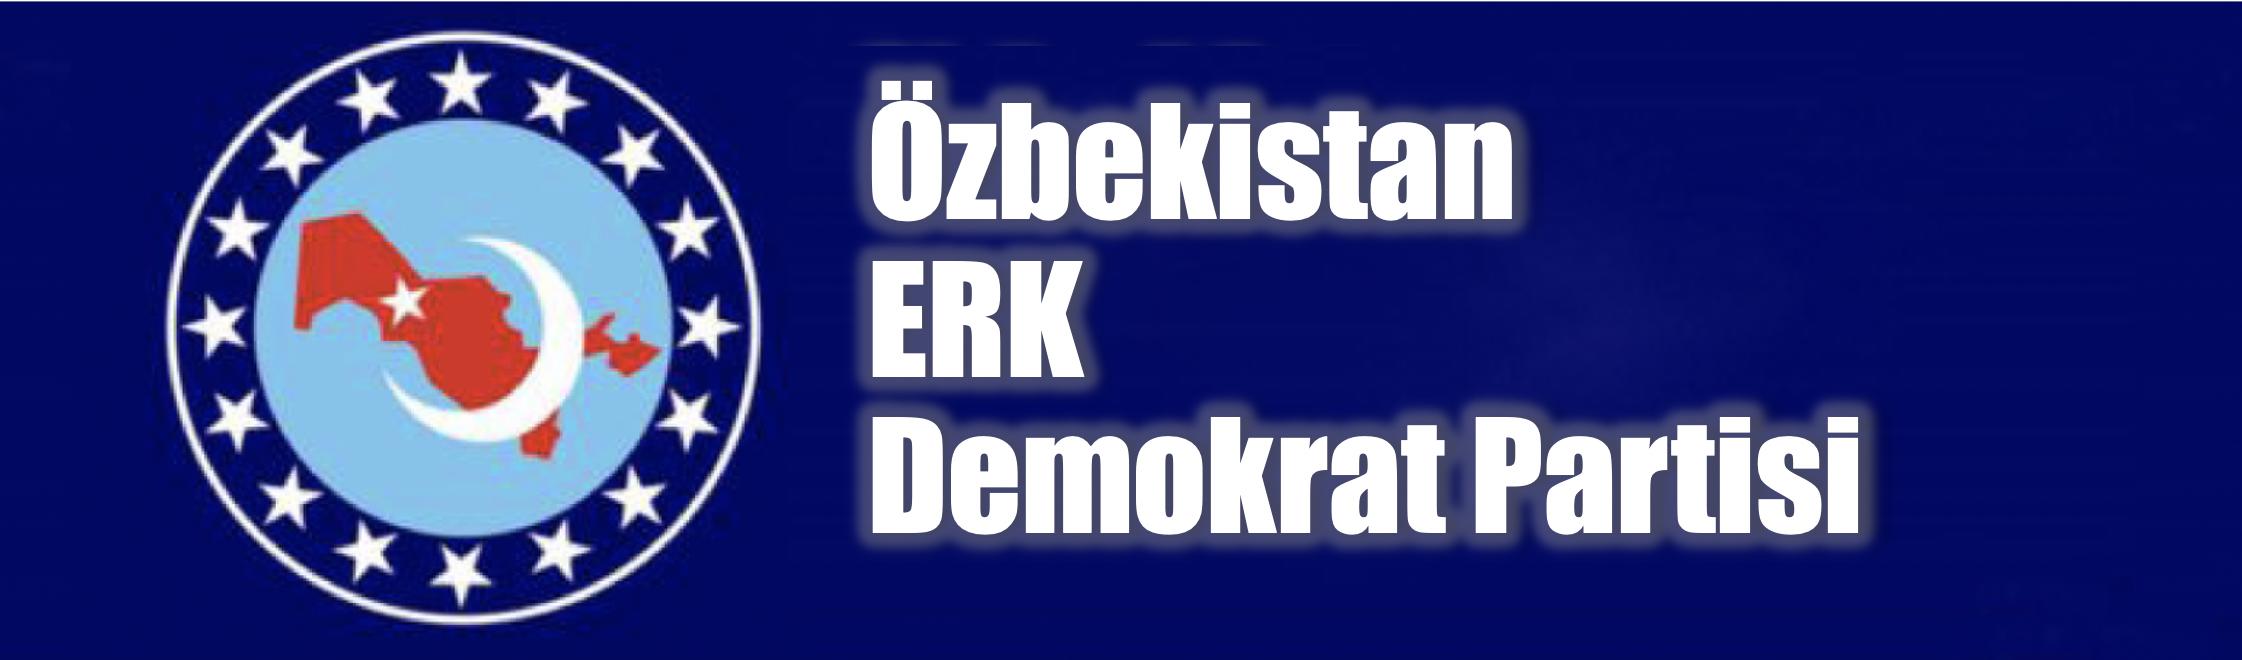 Özbekistan Erk Demokrat Partisi